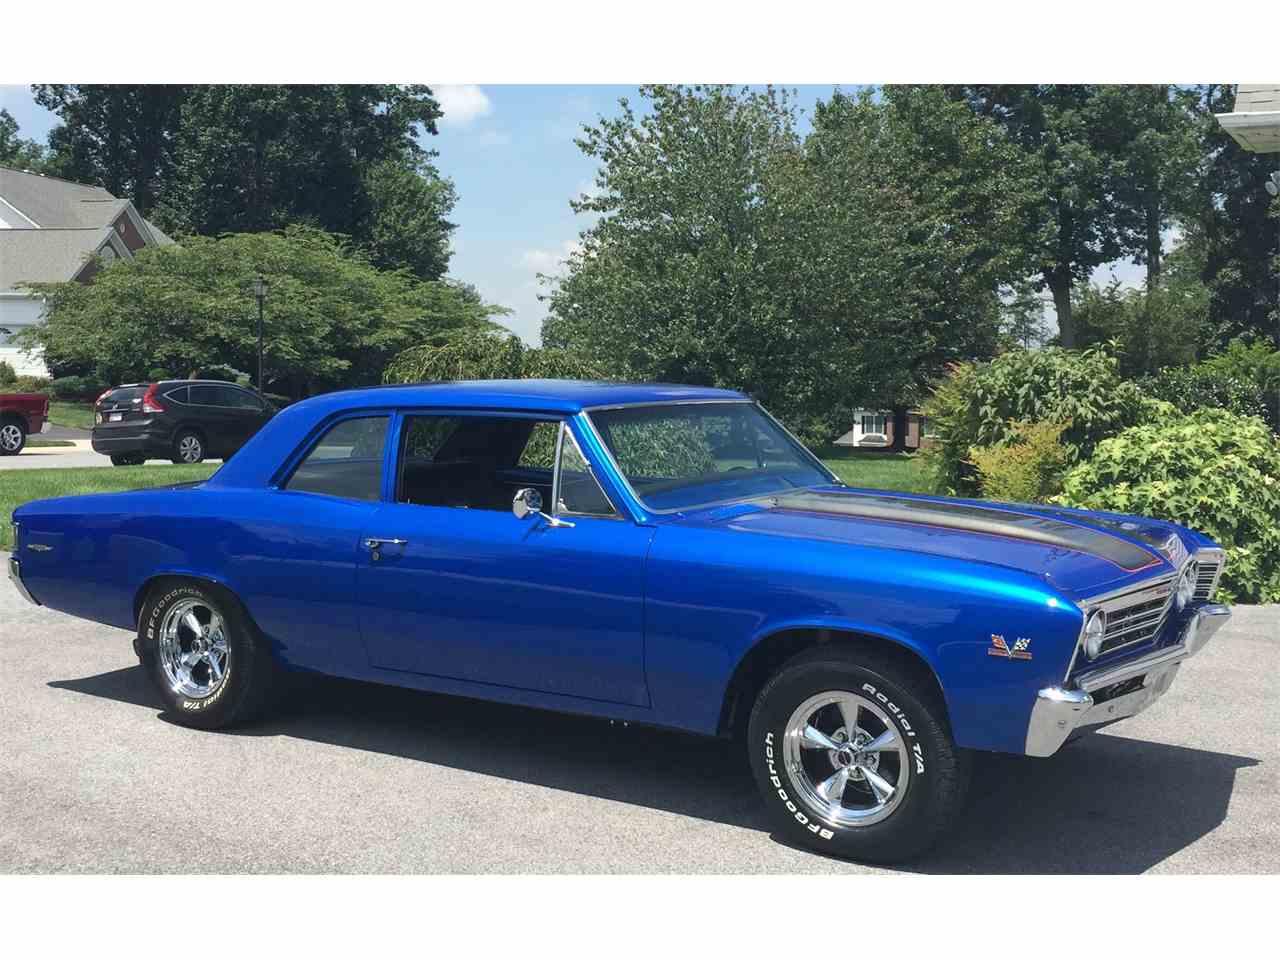 Chevrolet 2016 chevrolet chevelle : 1967 Chevrolet Chevelle for Sale   ClassicCars.com   CC-1012700